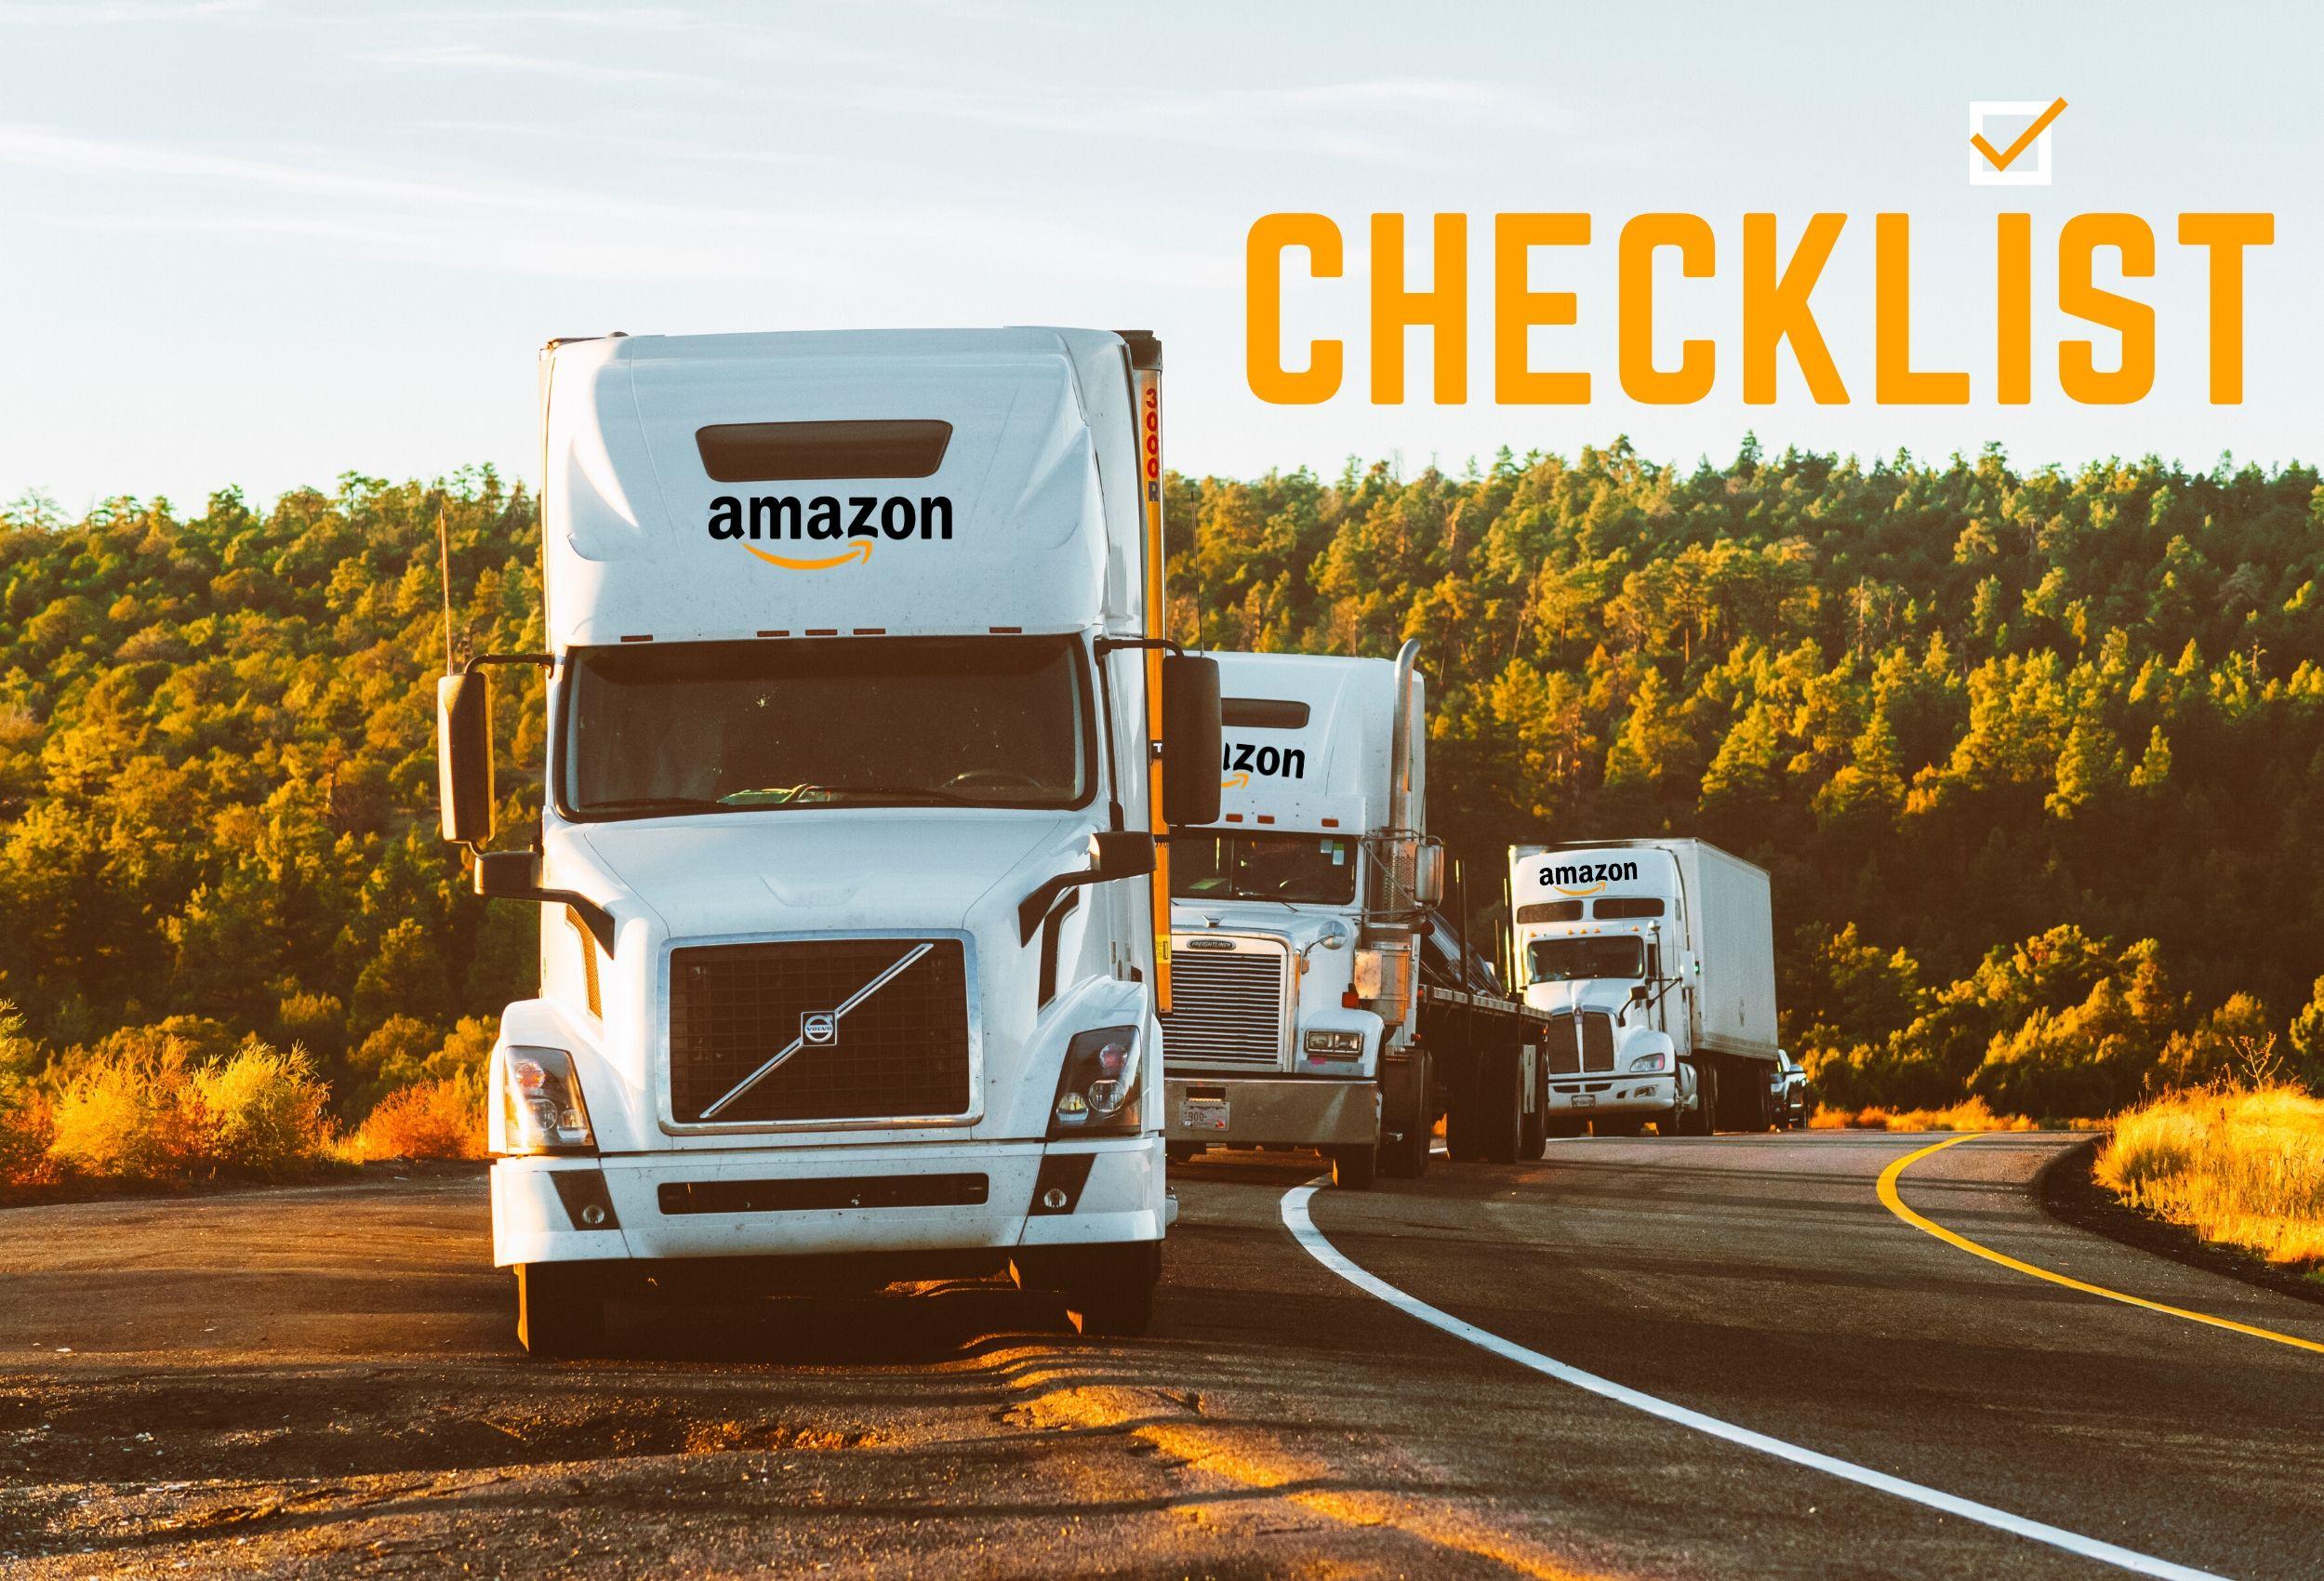 amazon checklist